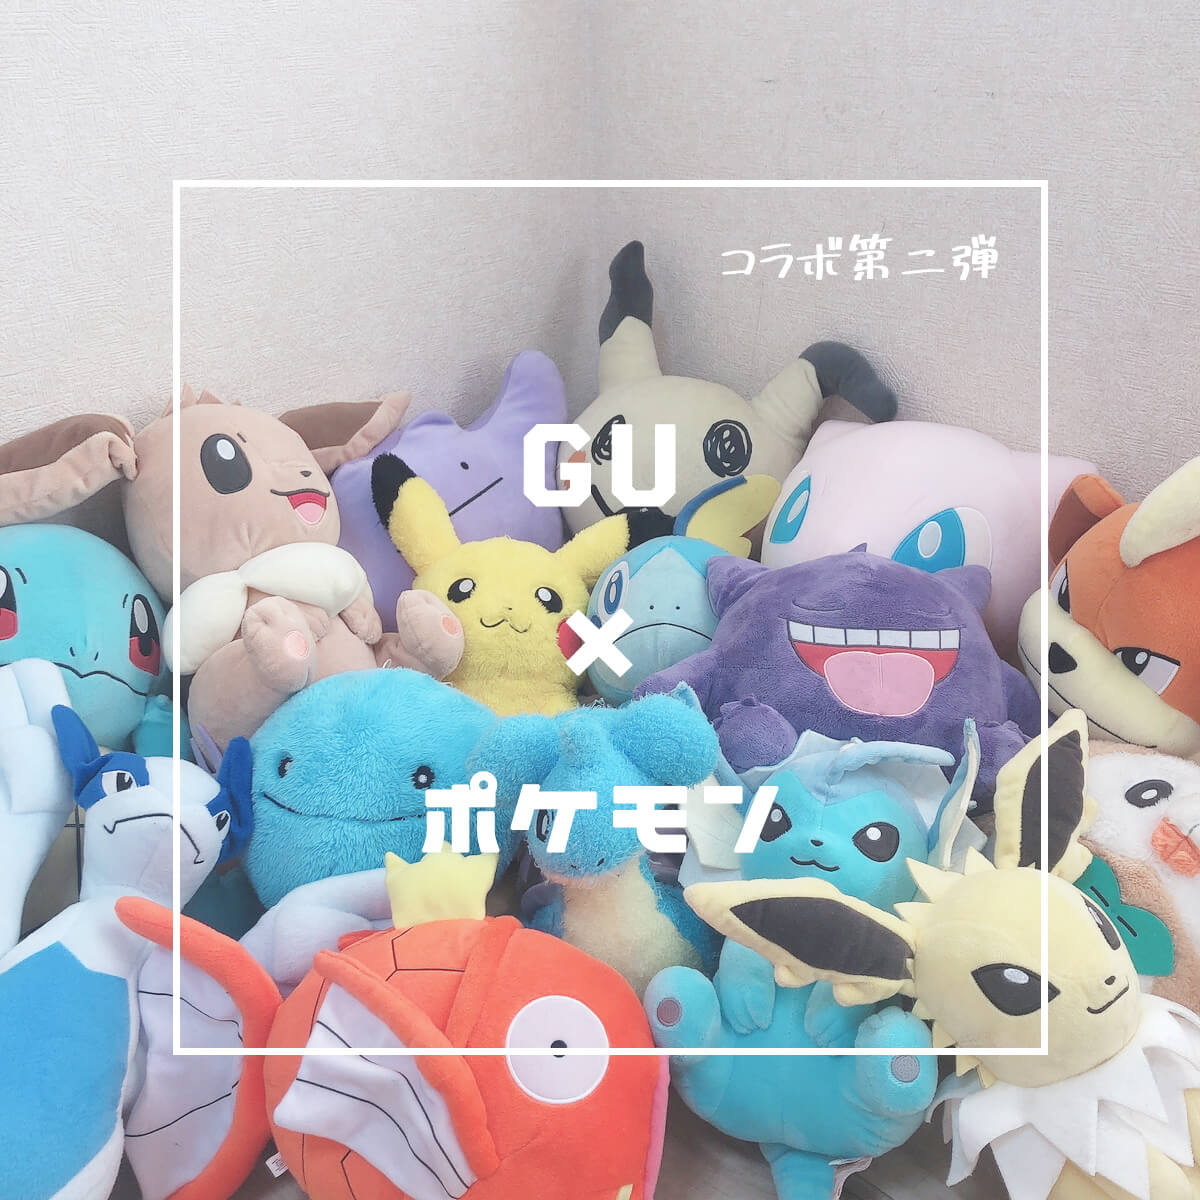 Gu ポケモン 2020